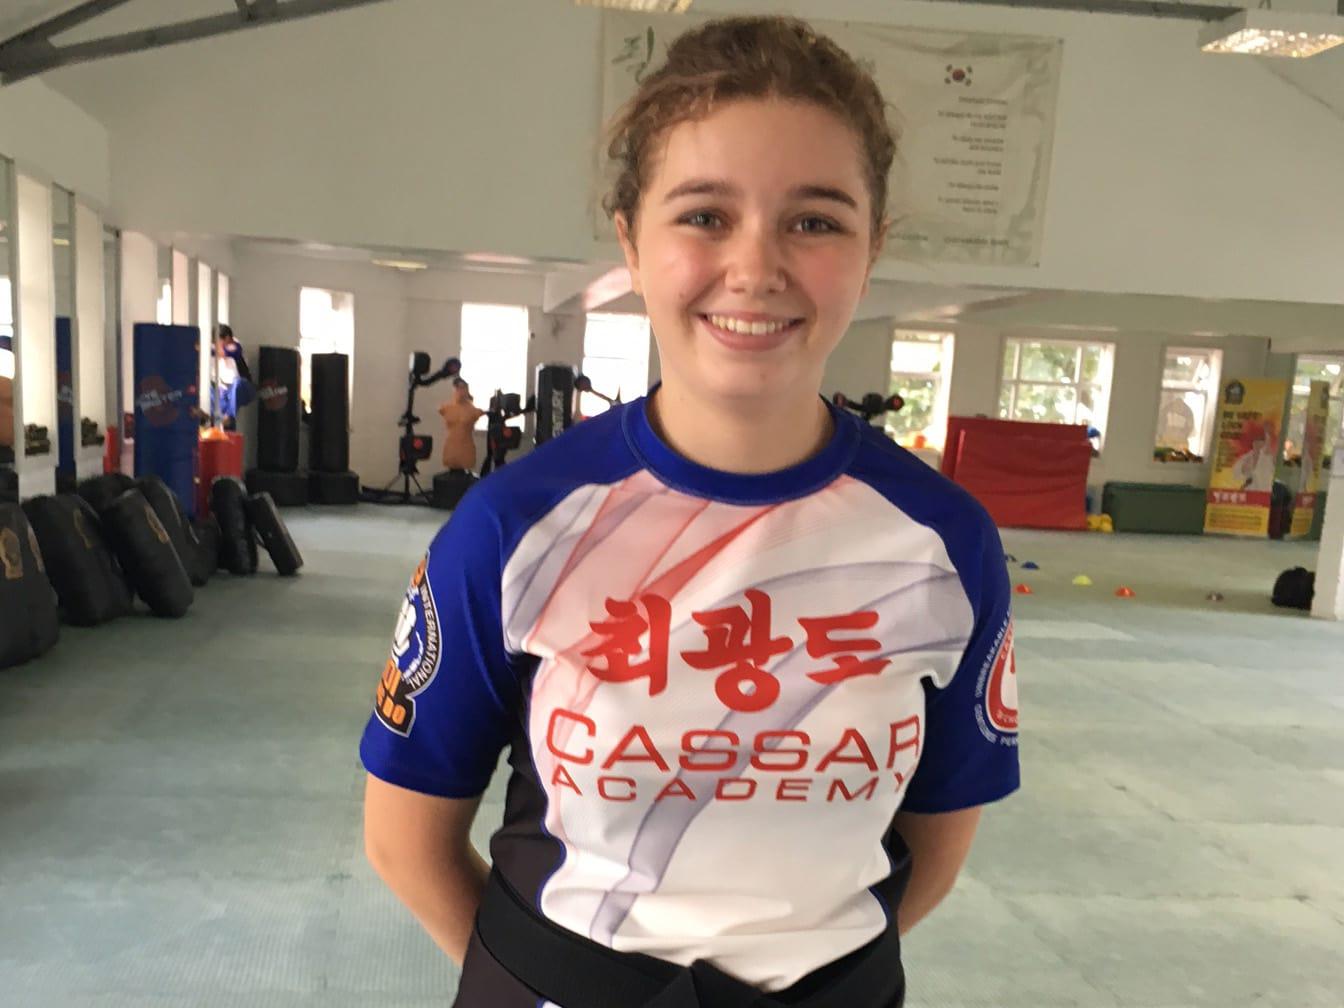 Sophie Cole in Wimbledon & Morden - Cassar Academy